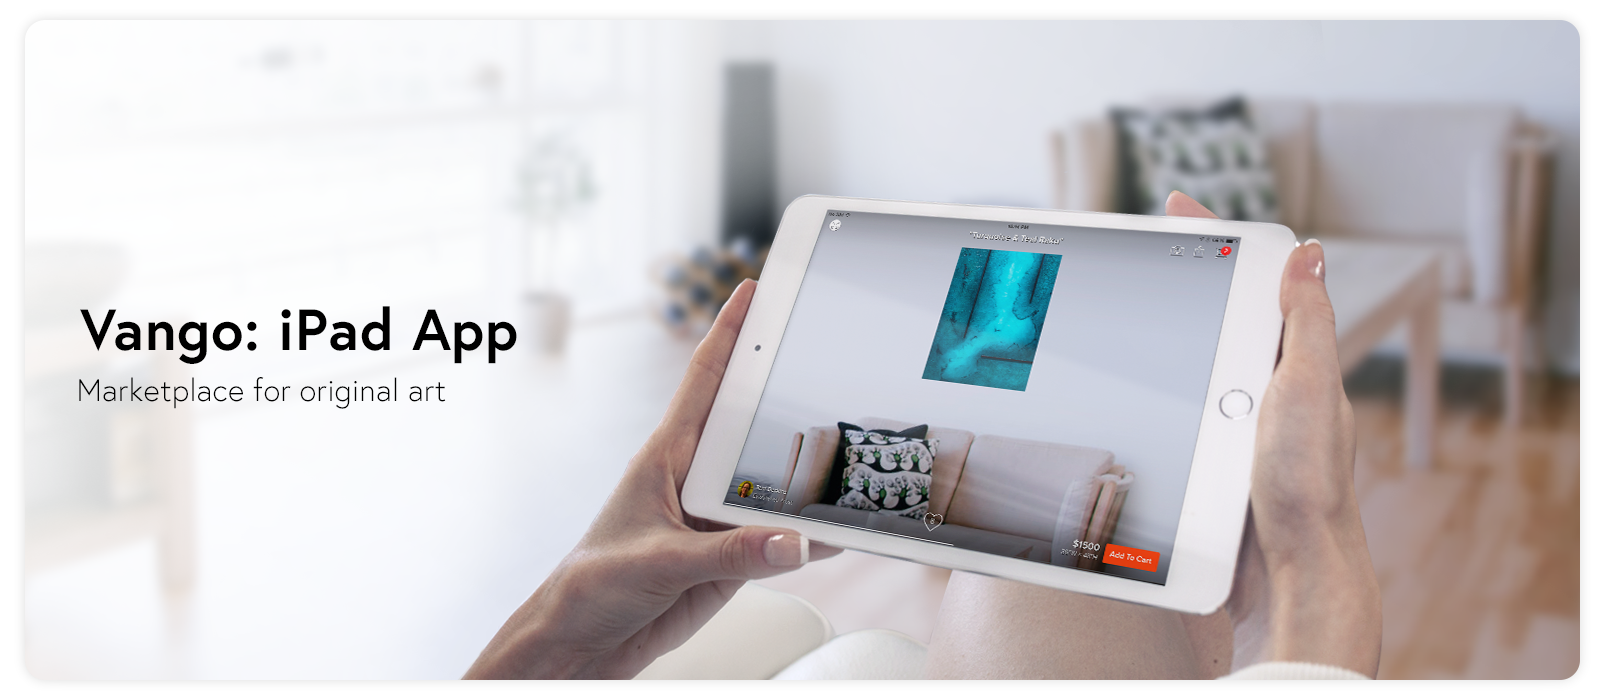 ipad-app-header-large.png